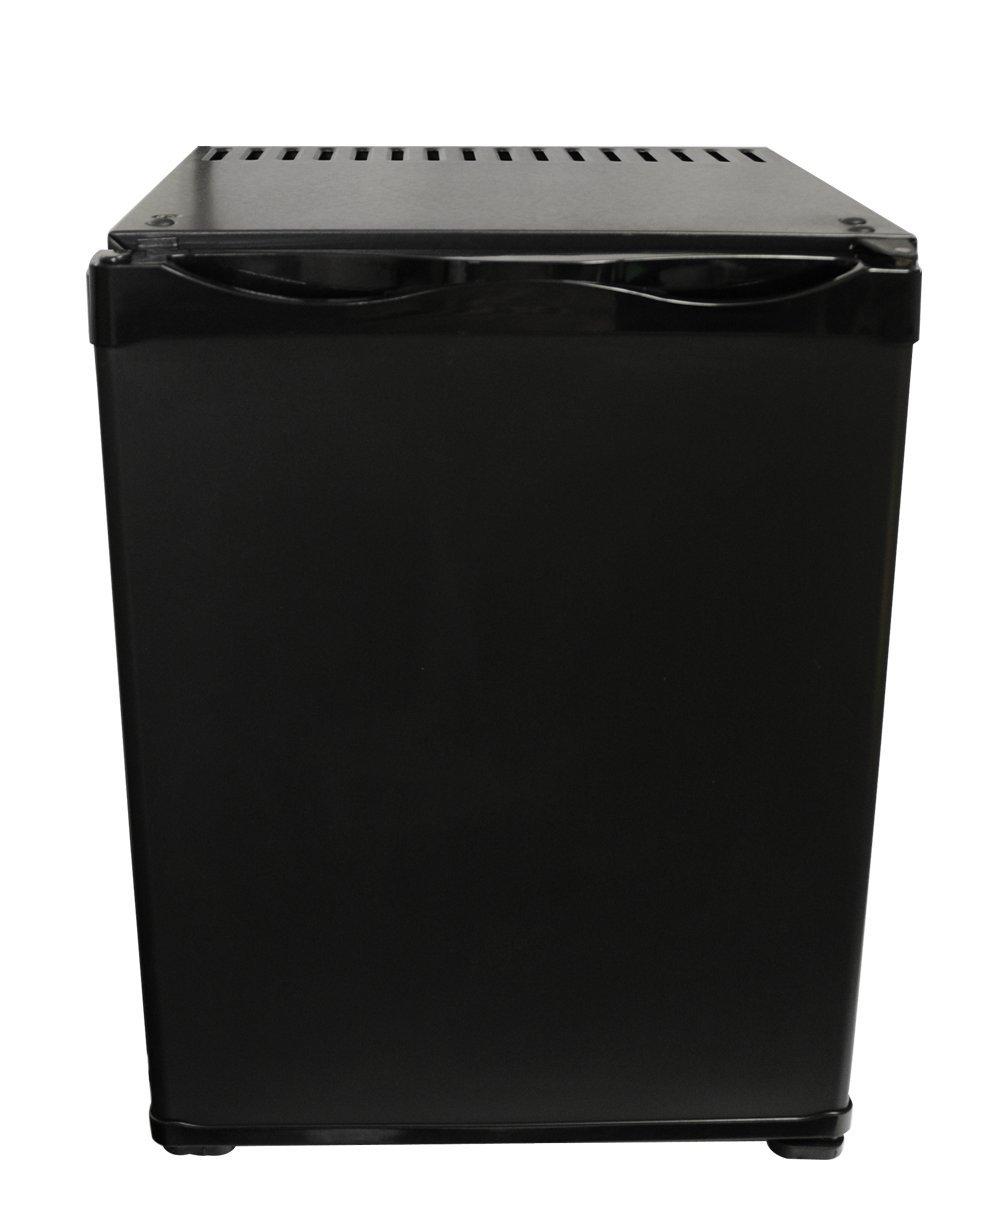 ATENARU 25リットル無音無振動小型冷蔵庫 アンモニア吸収式 クラシックブラック 左開き   B01KT480W6